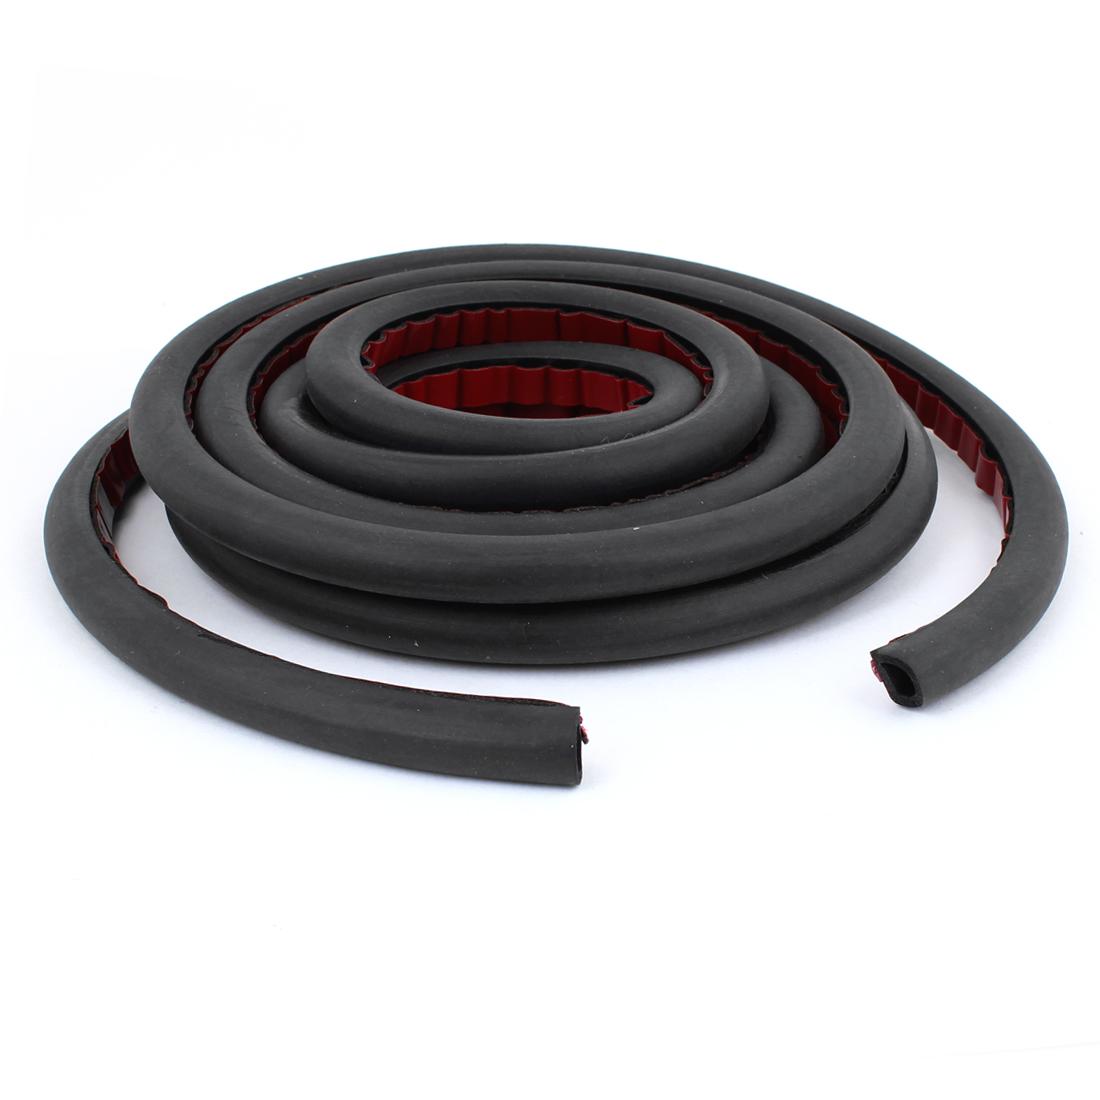 Black Rubber D Shaped Car Door Window Noise Sealing Strip 3.5 Meters Long